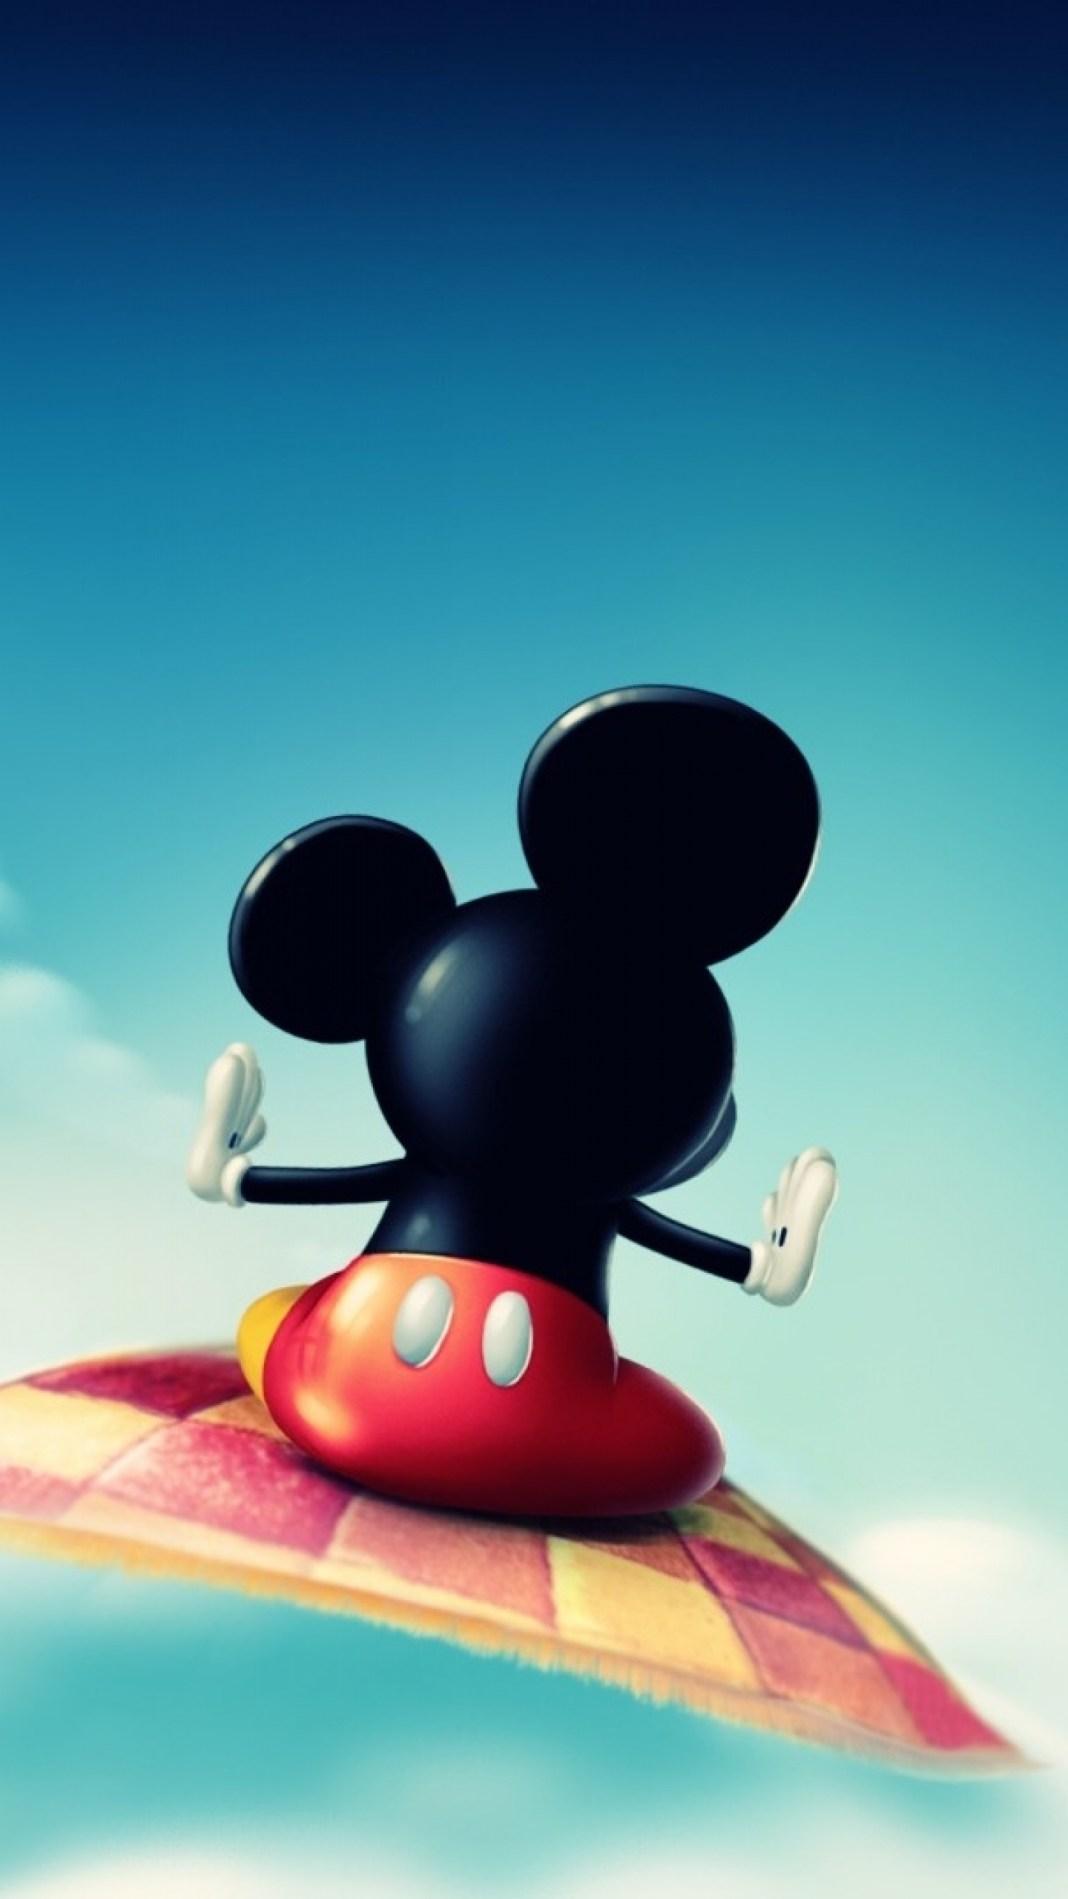 mickey_mouse_fly_sky_toon_68122_1440x2560